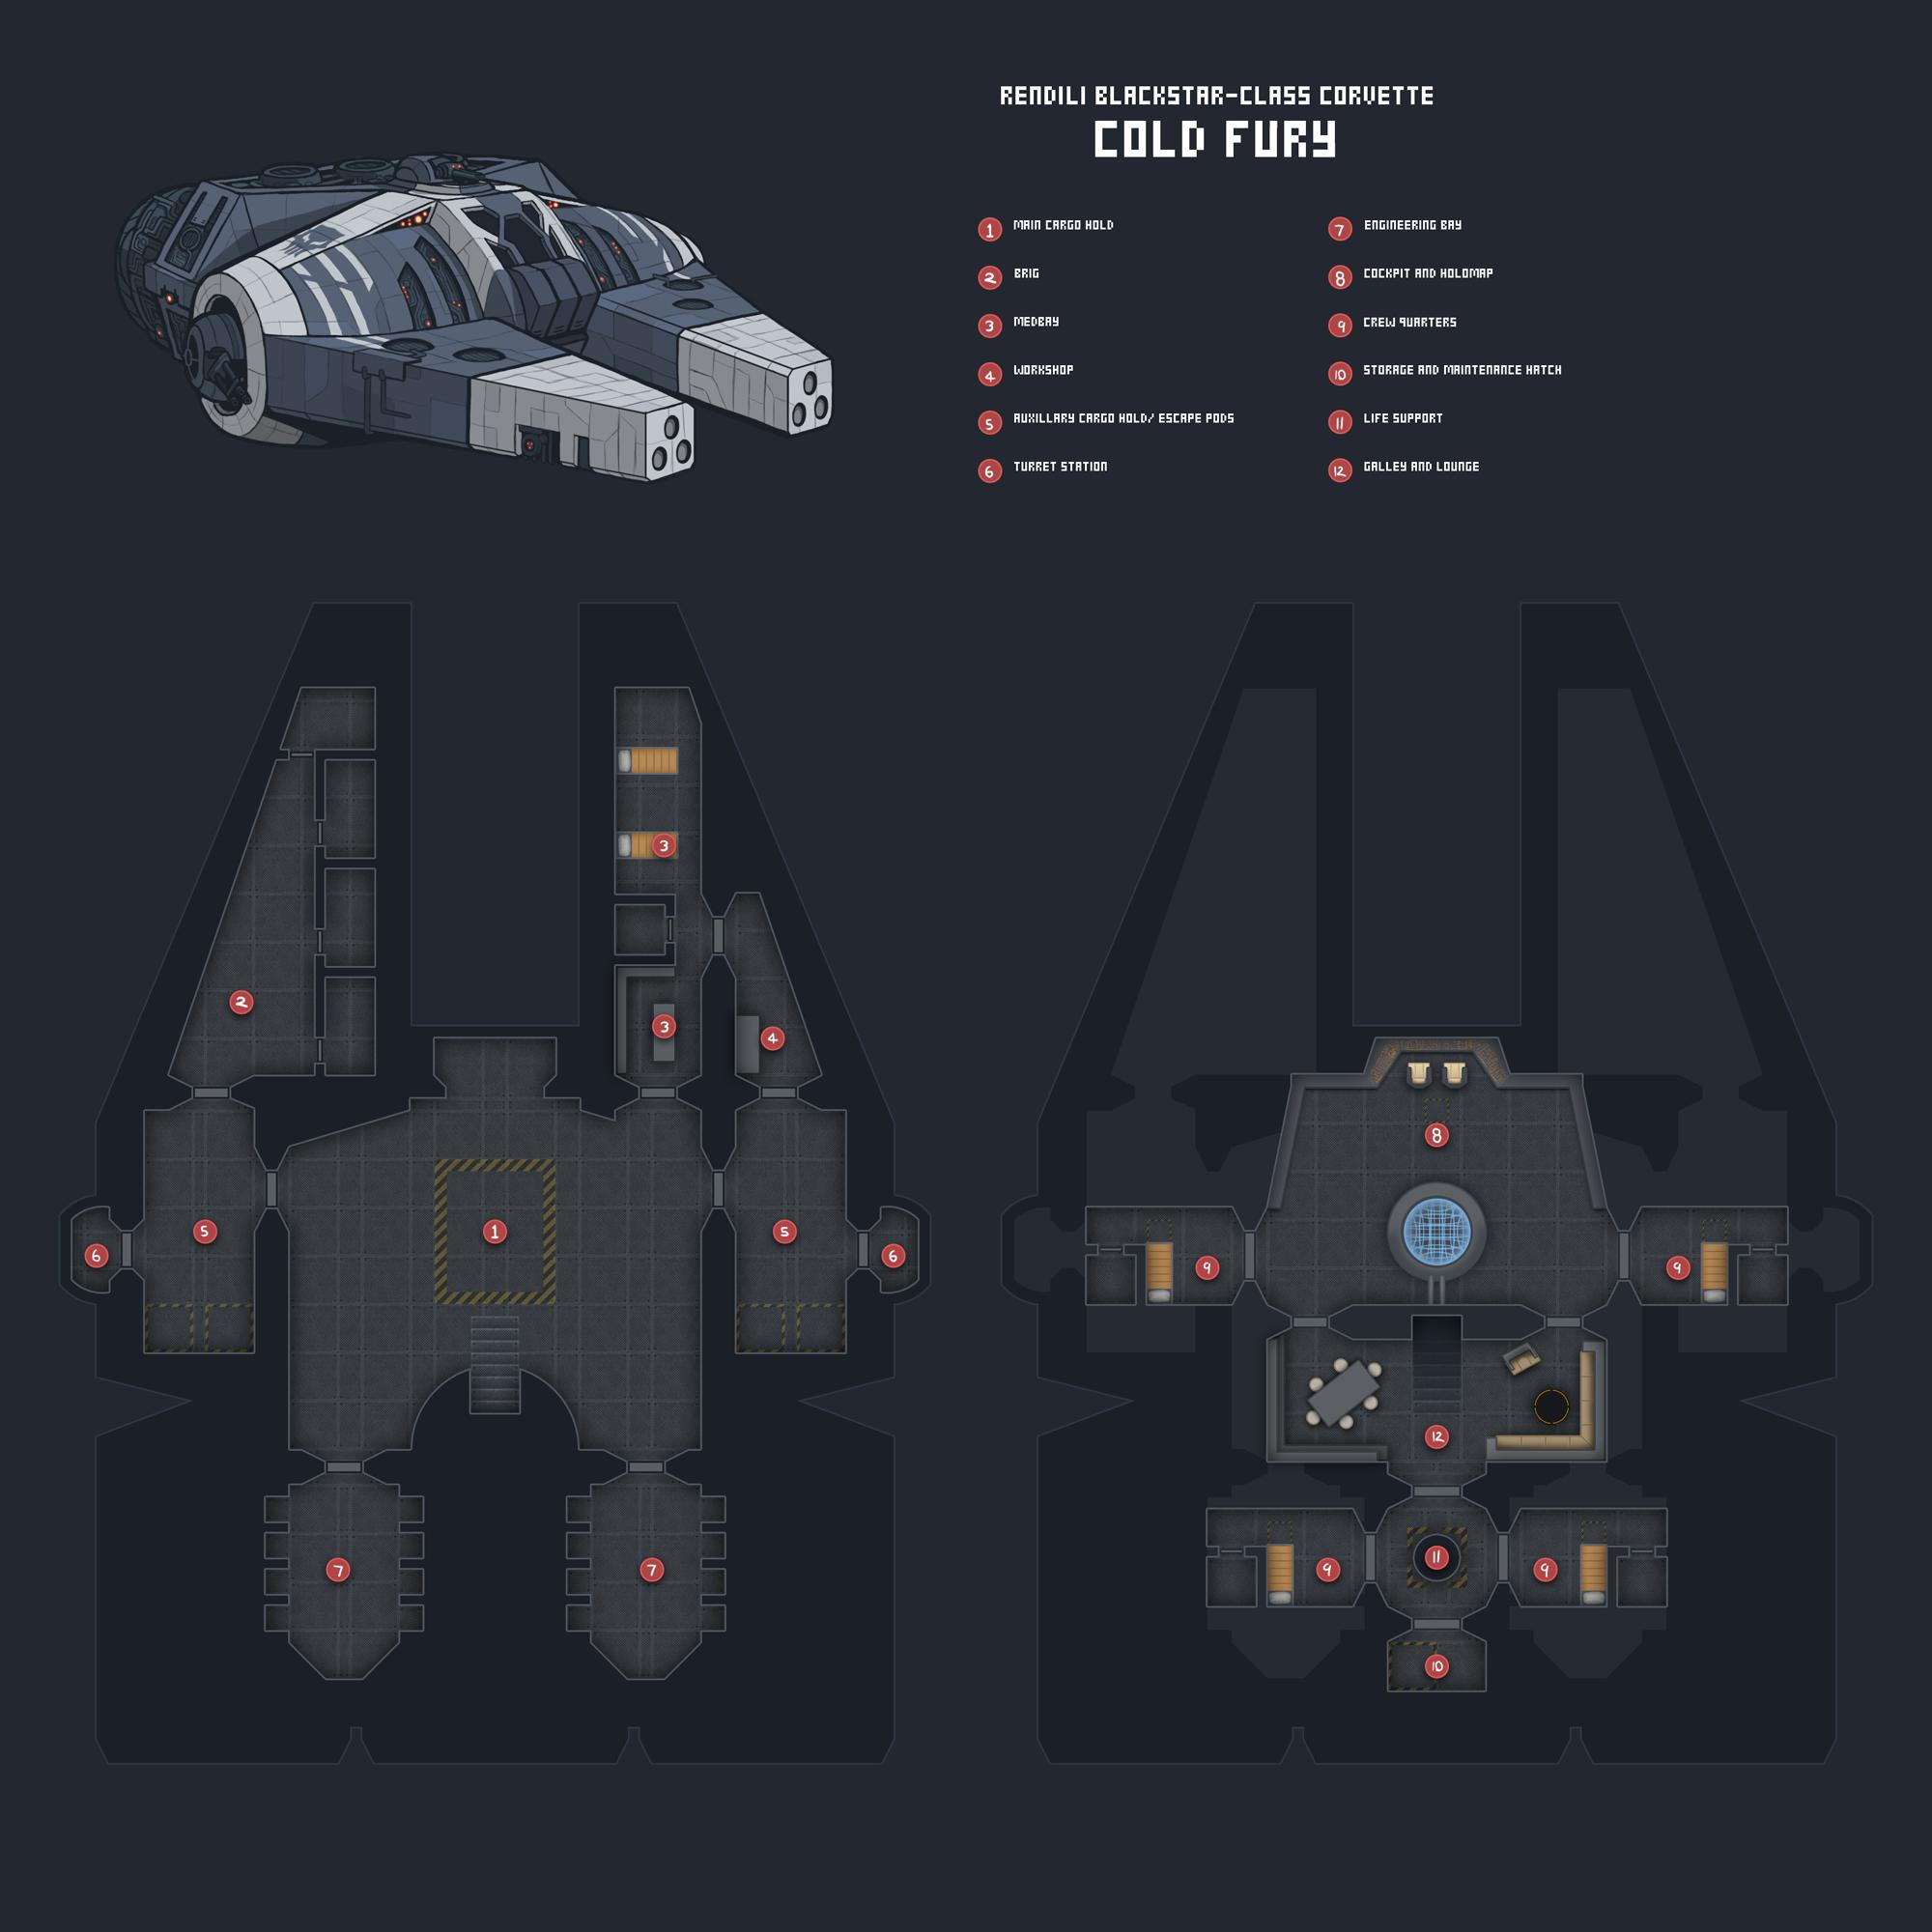 Star Wars Ship Floor Plans Part - 36: Cold Fury Deckplan By Blazbaros Cold Fury Deckplan By Blazbaros